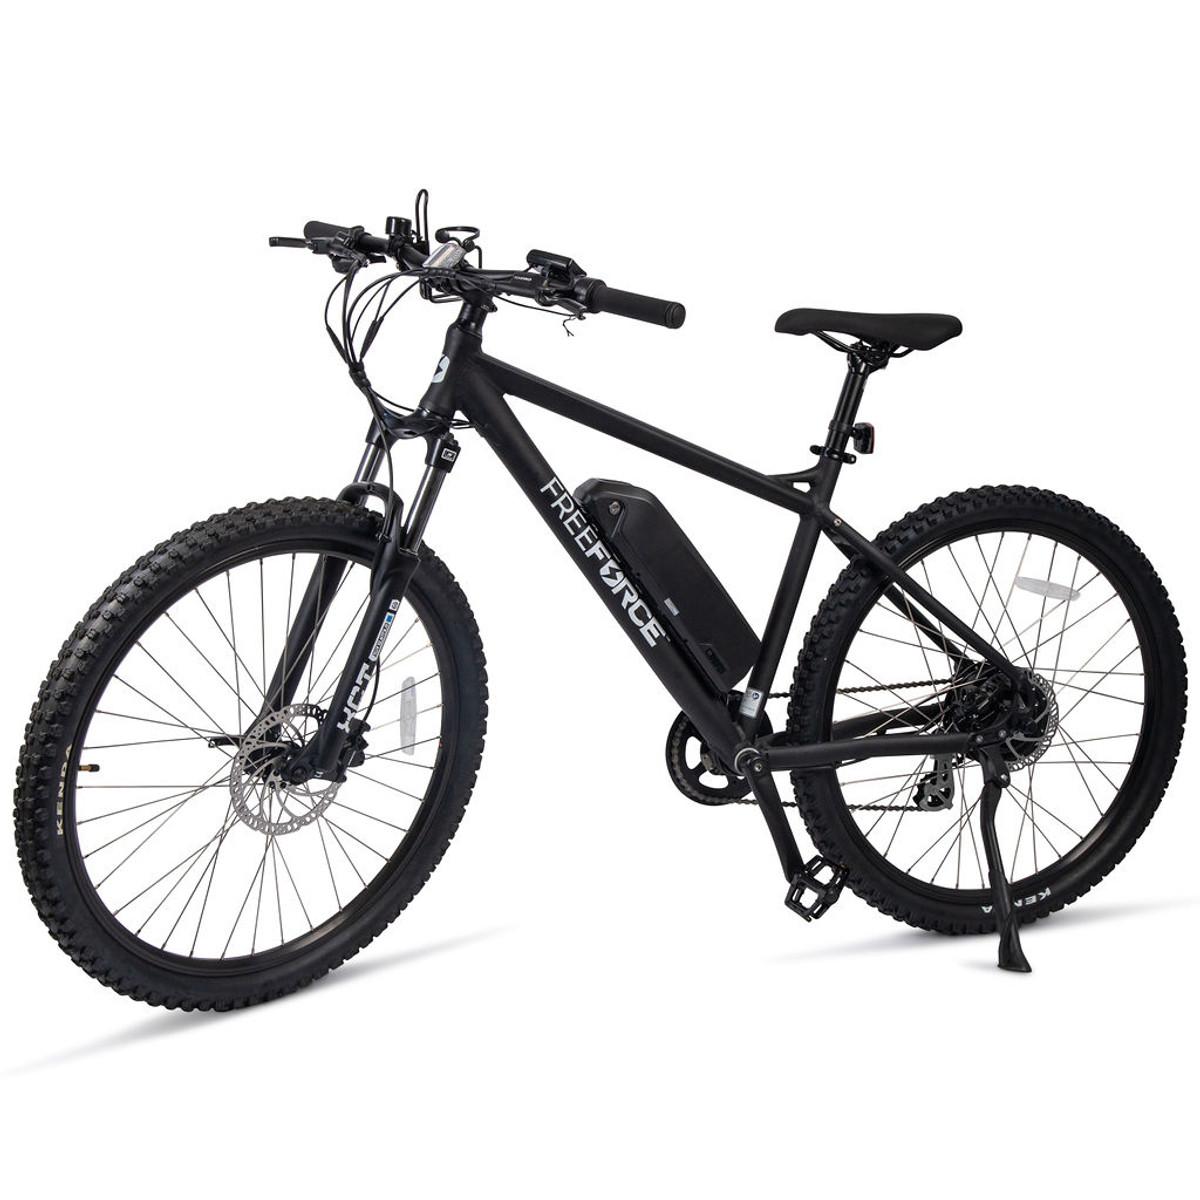 "The Denver Electric Mountain Bike - Matte Black 20"" Frame"